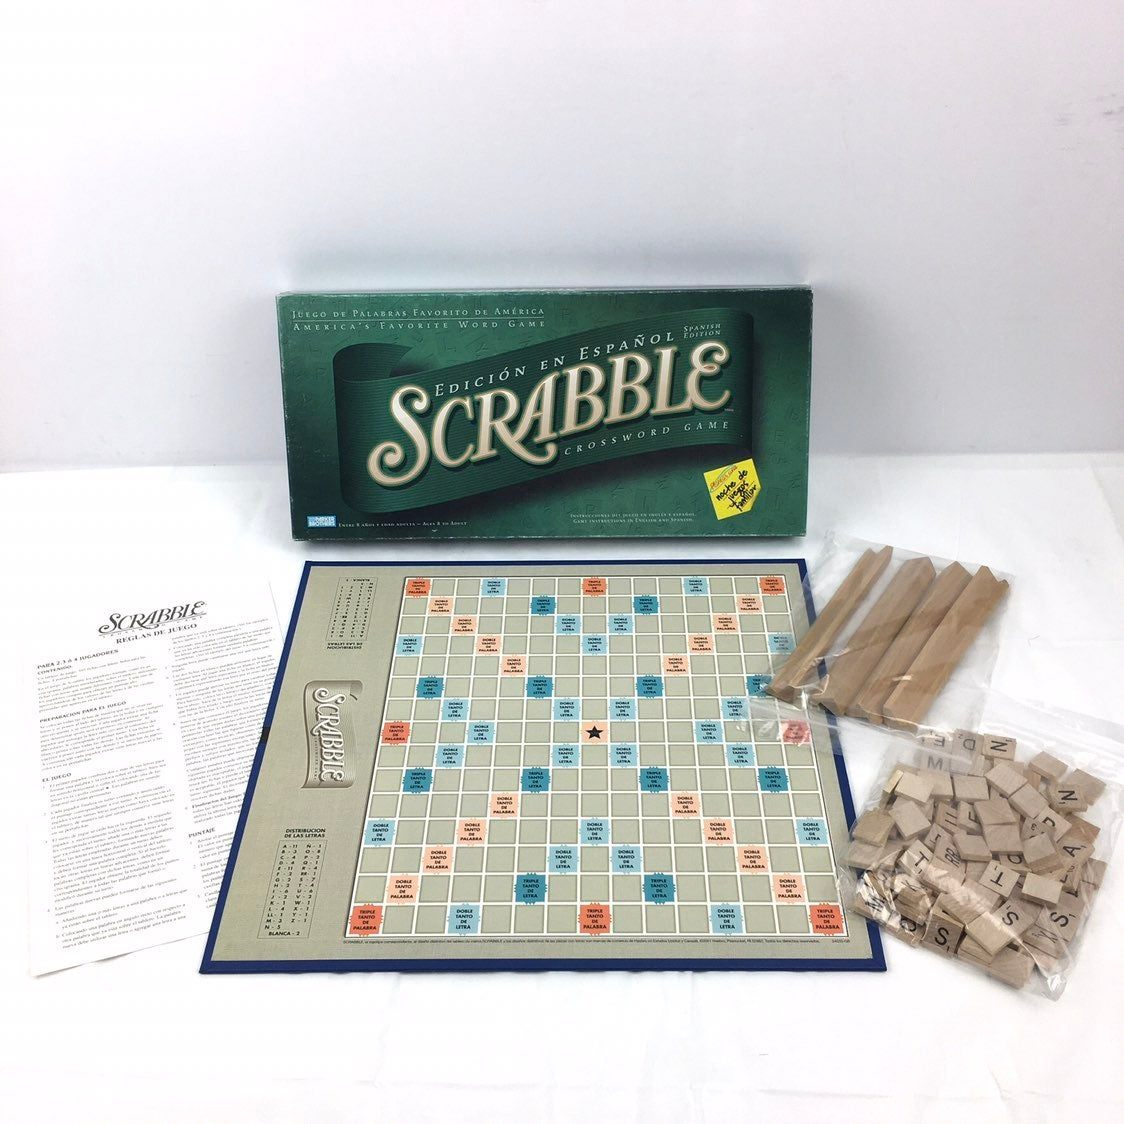 Scrabble Spanish Edición En Espanol